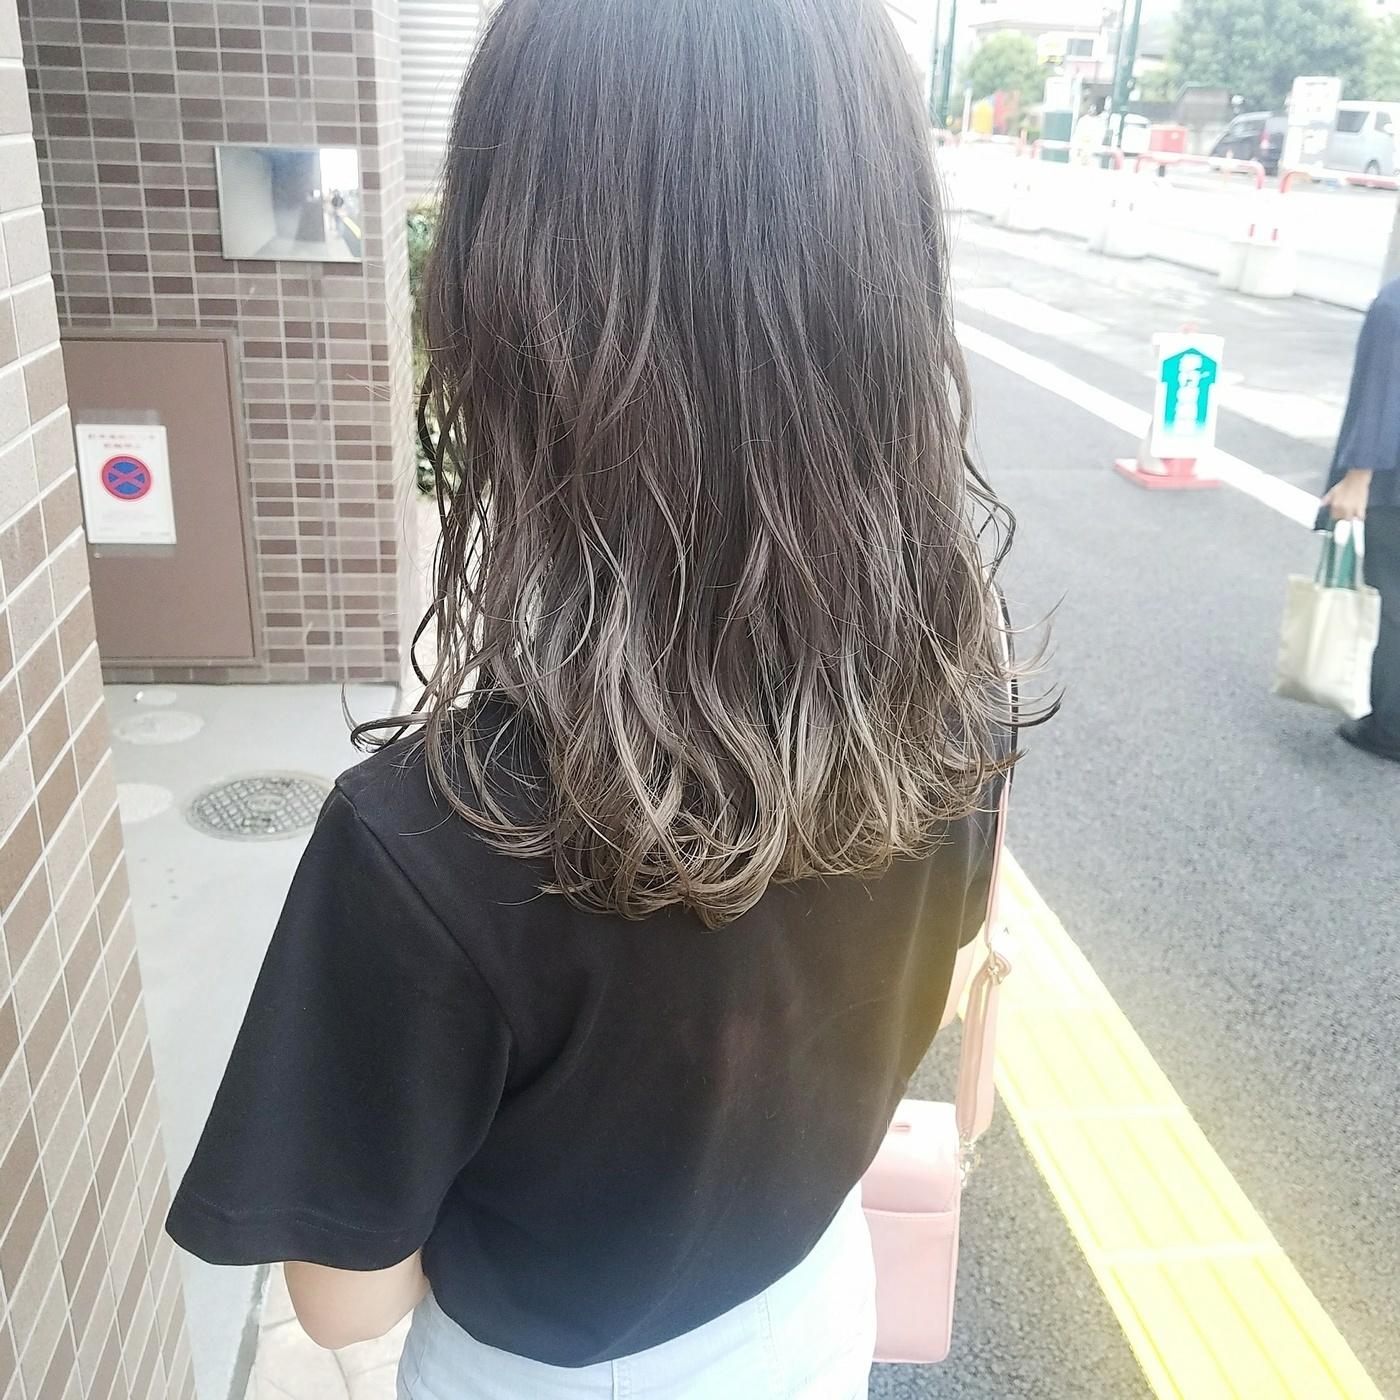 a34976fa496c ヘアカタログ】毛先だけ染めて、黒髪もグラデーションスタイルに ...